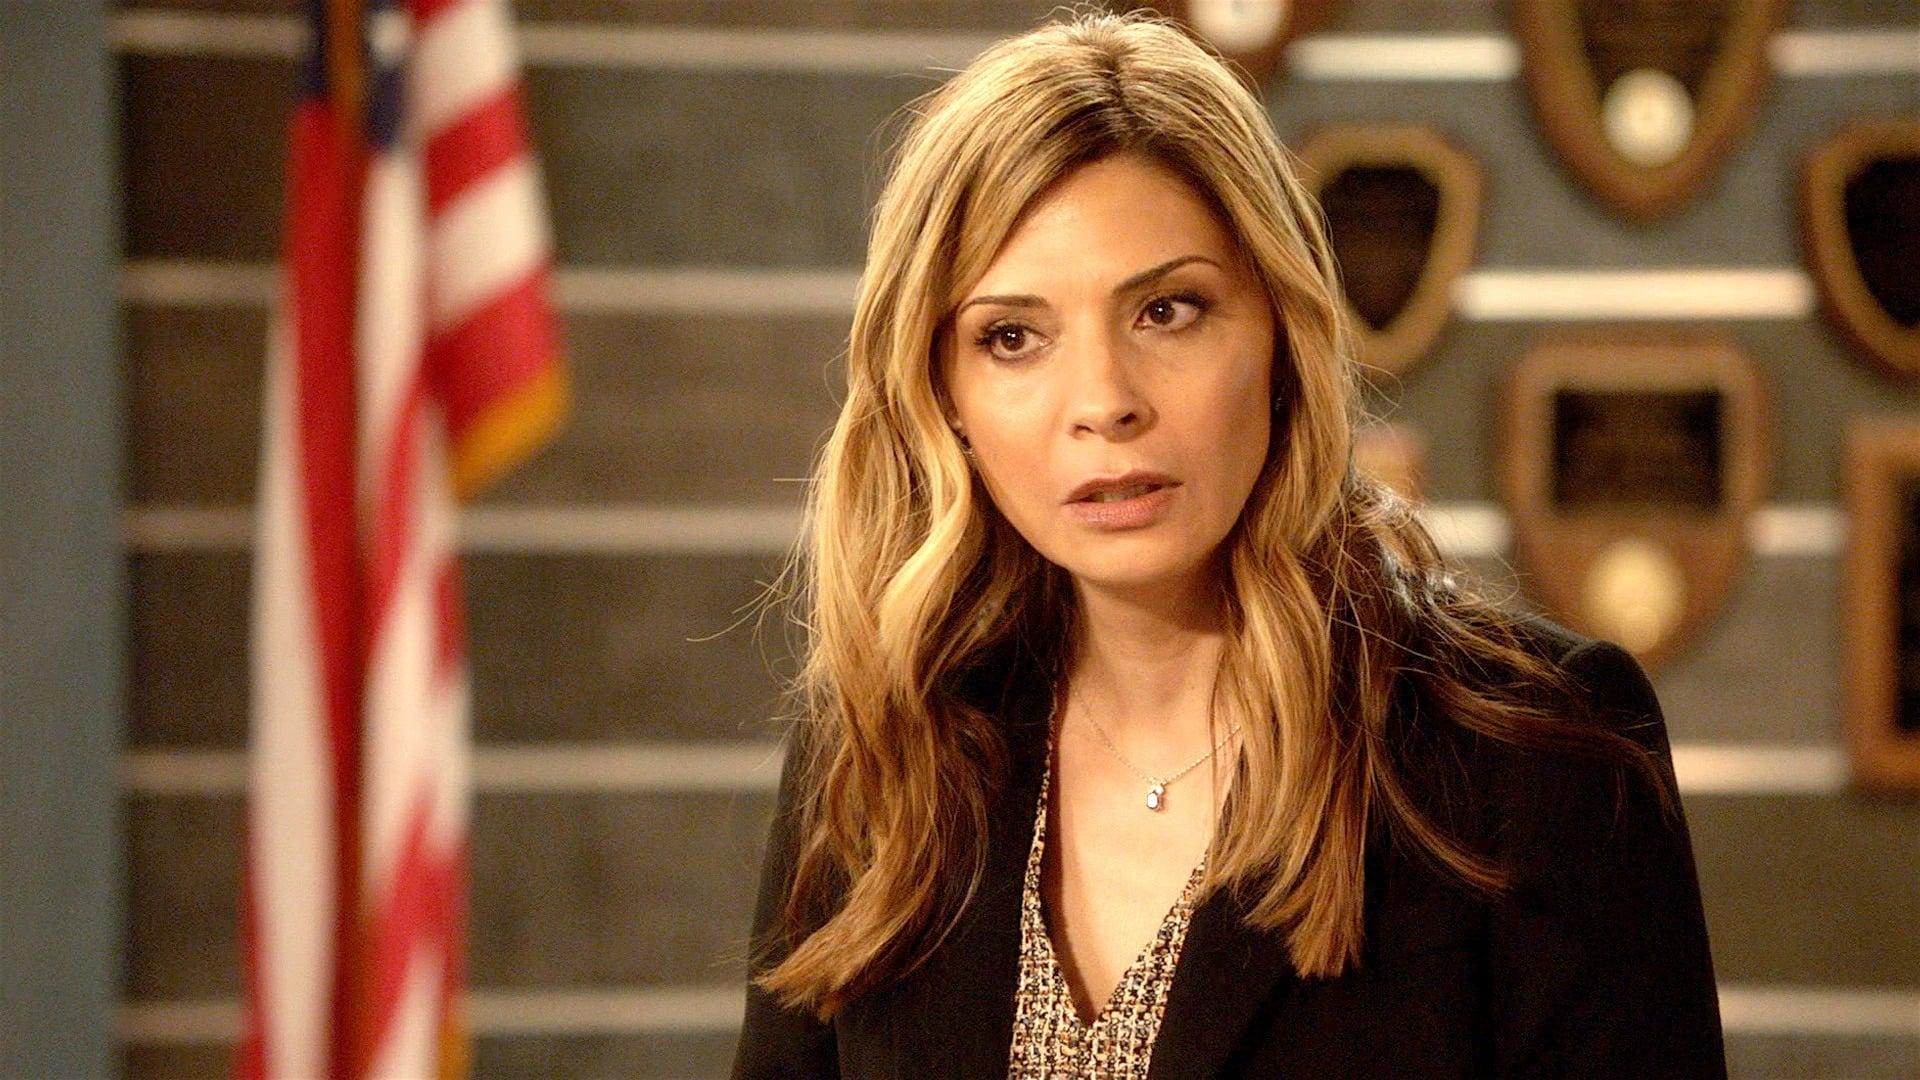 Law & Order: Special Victims Unit - Season 20 Episode 18 : Blackout